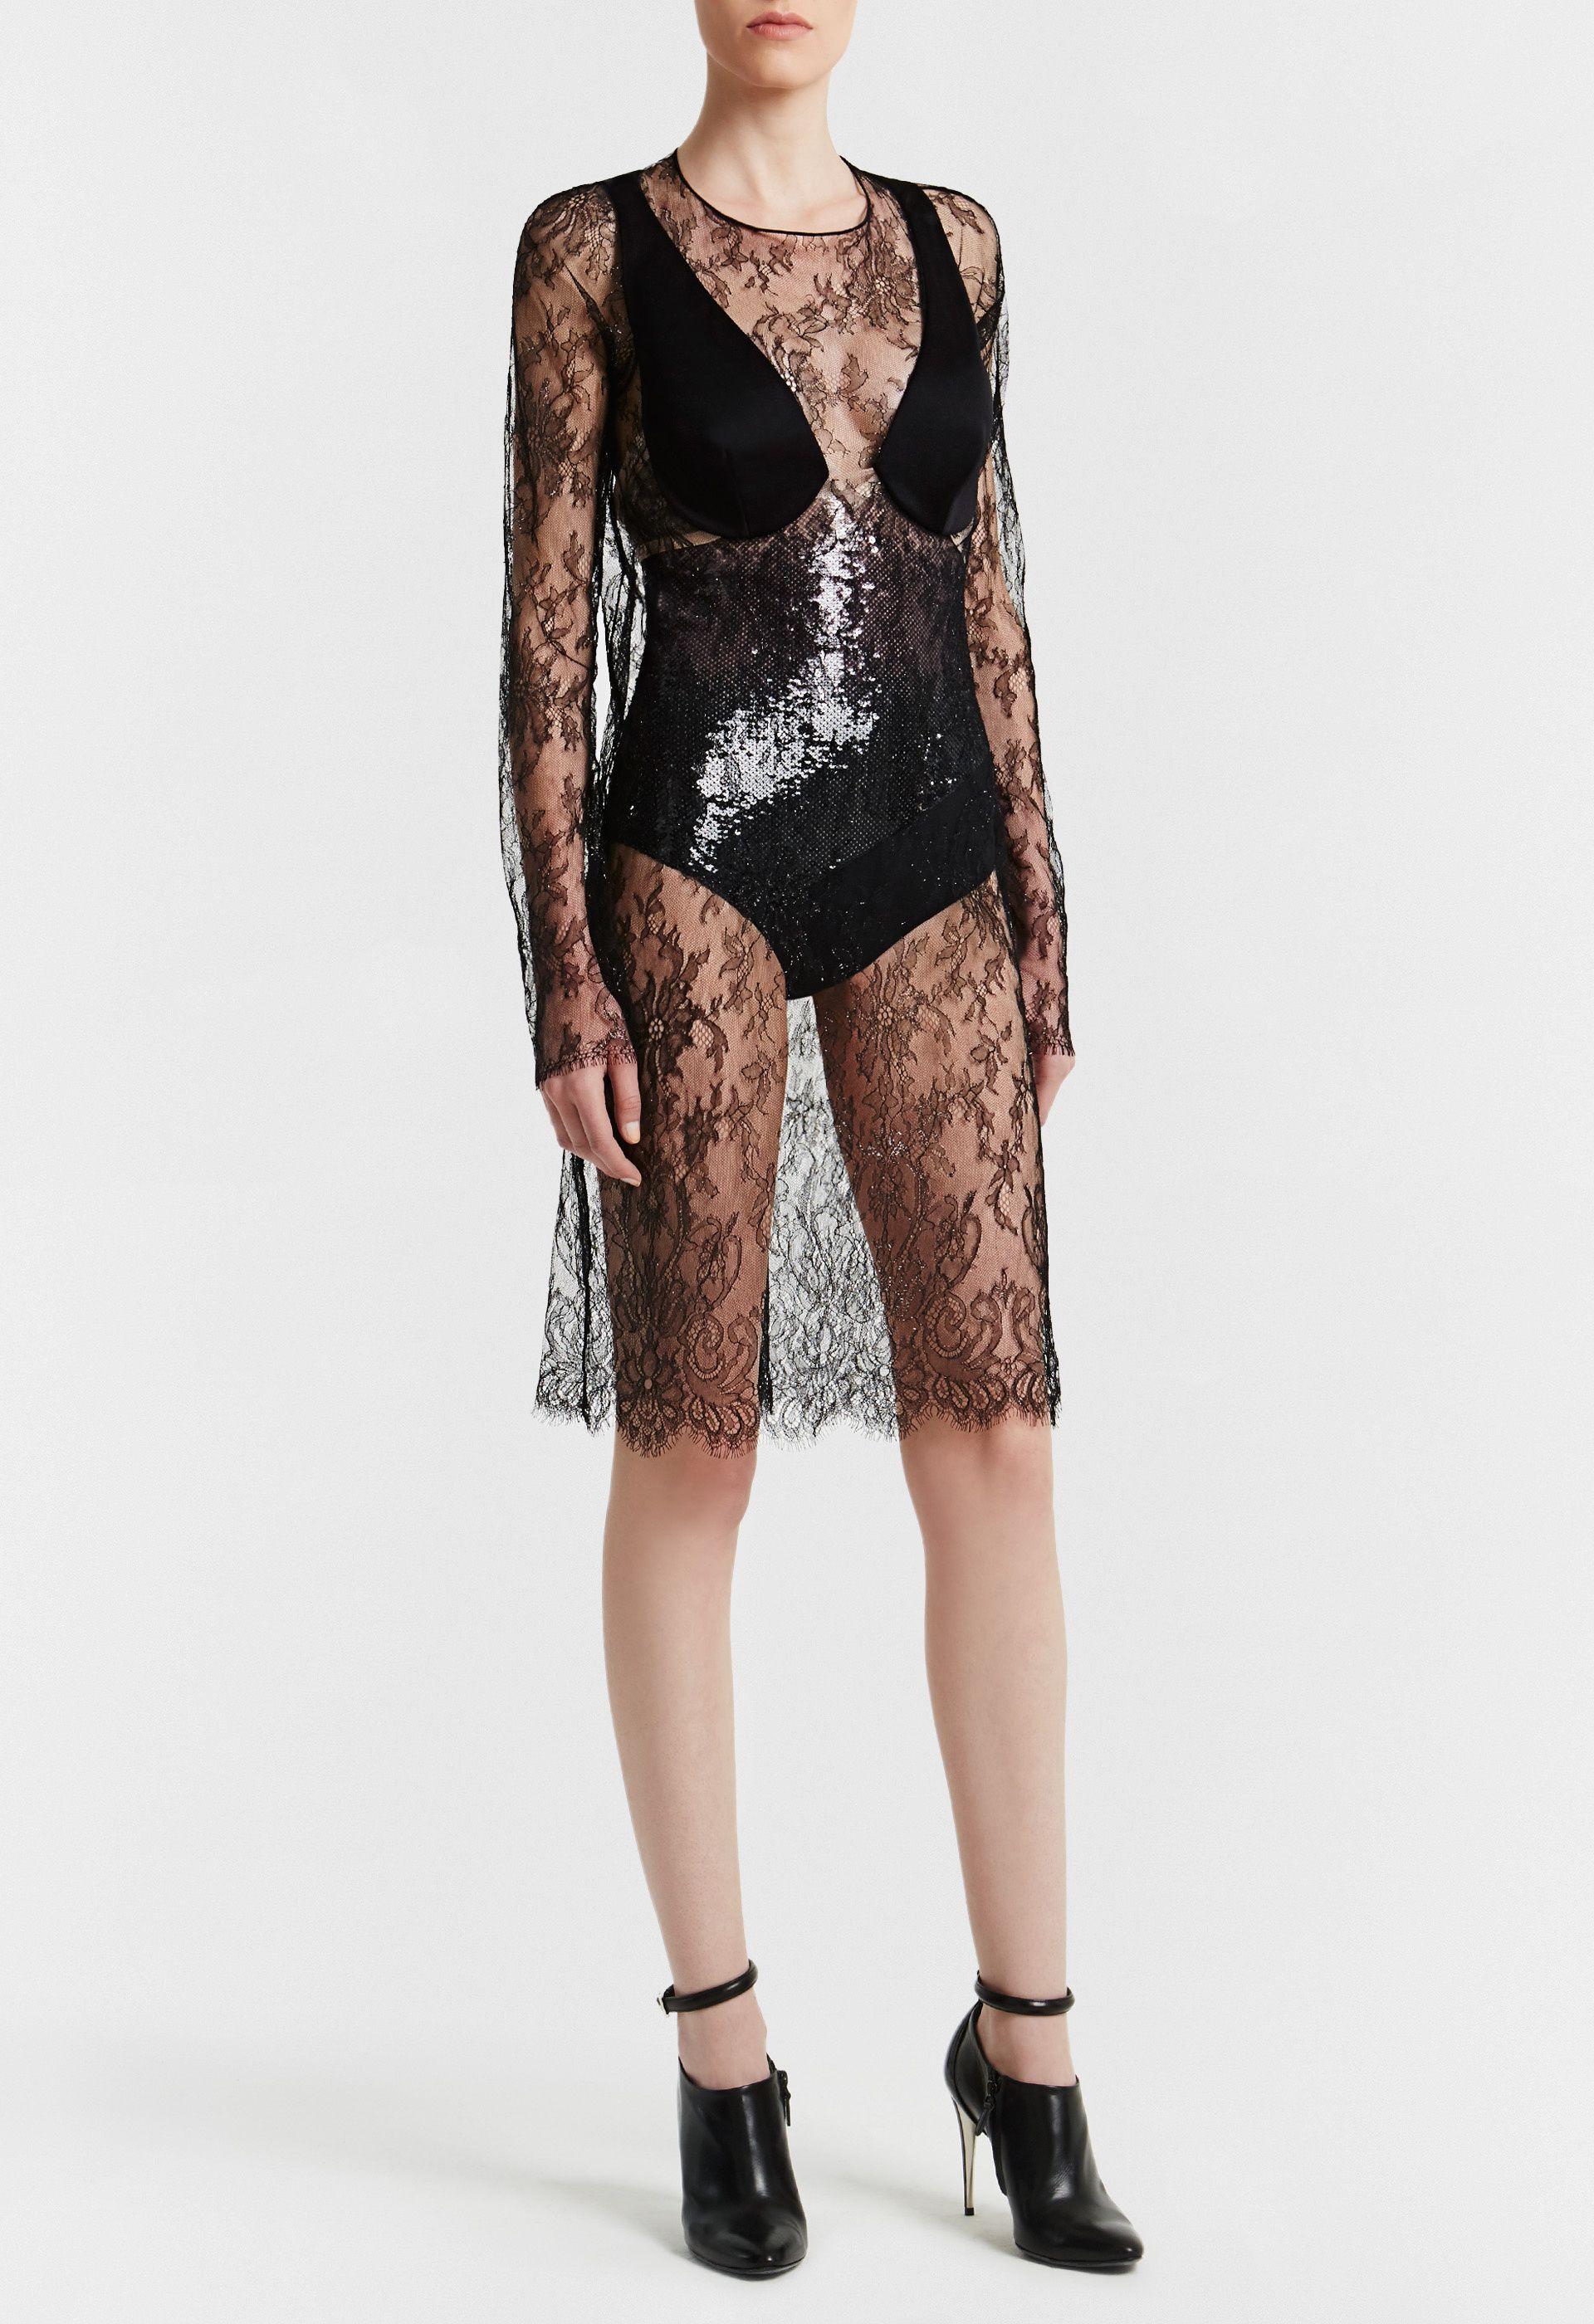 LA PERLA | Robe à armatures #laperlalingerie #lingerie